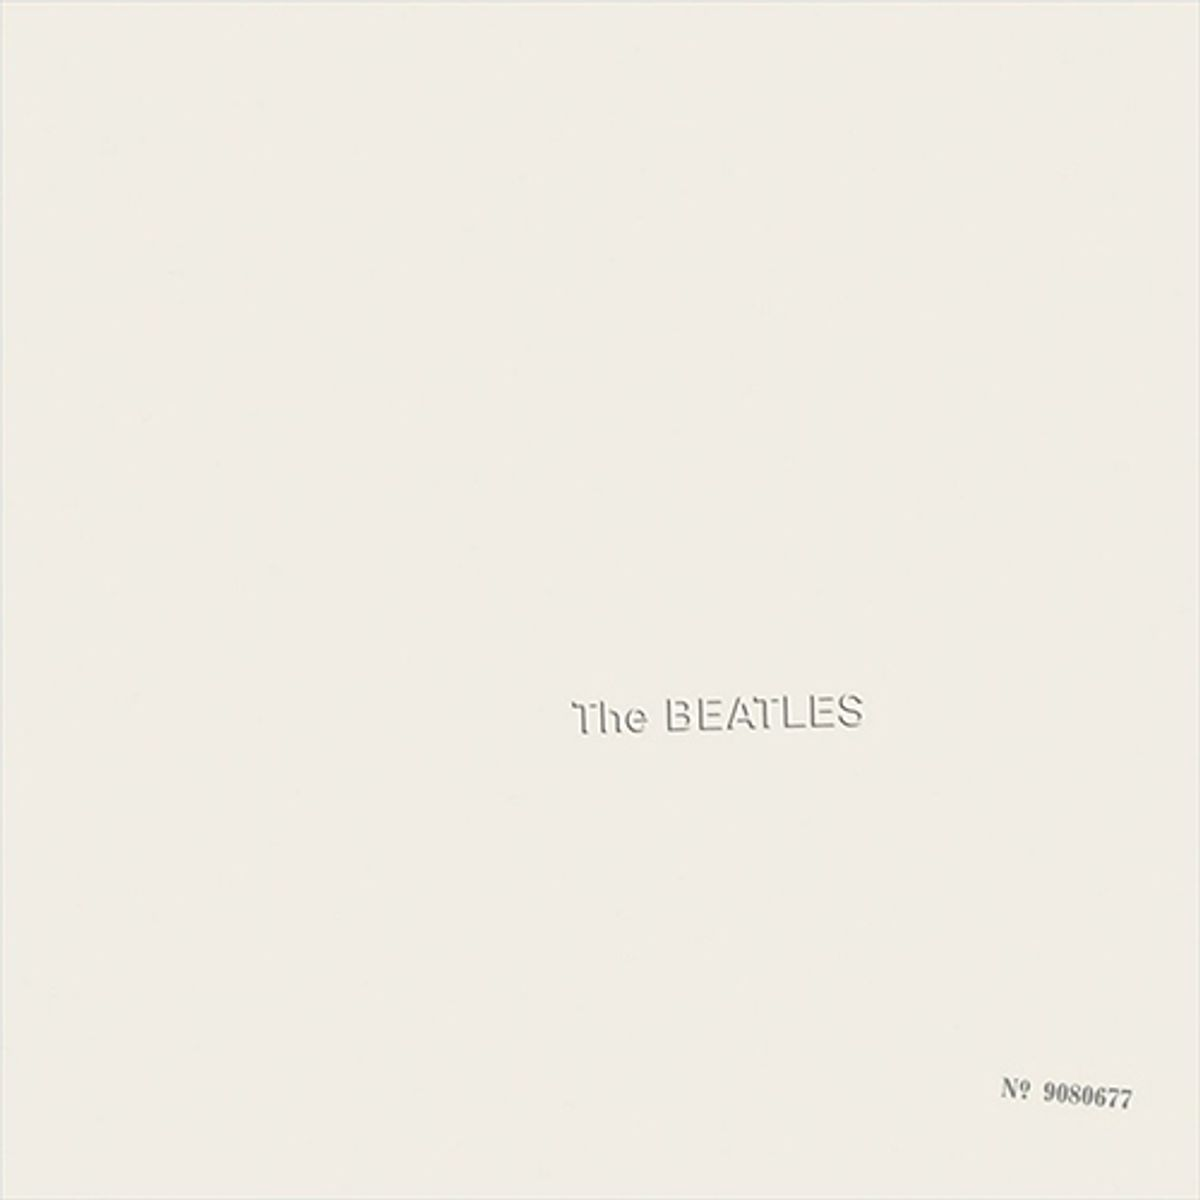 #Dubbelaars - The Beatles - Happiness is a Warm Gun - 'The Beatles' (1968)